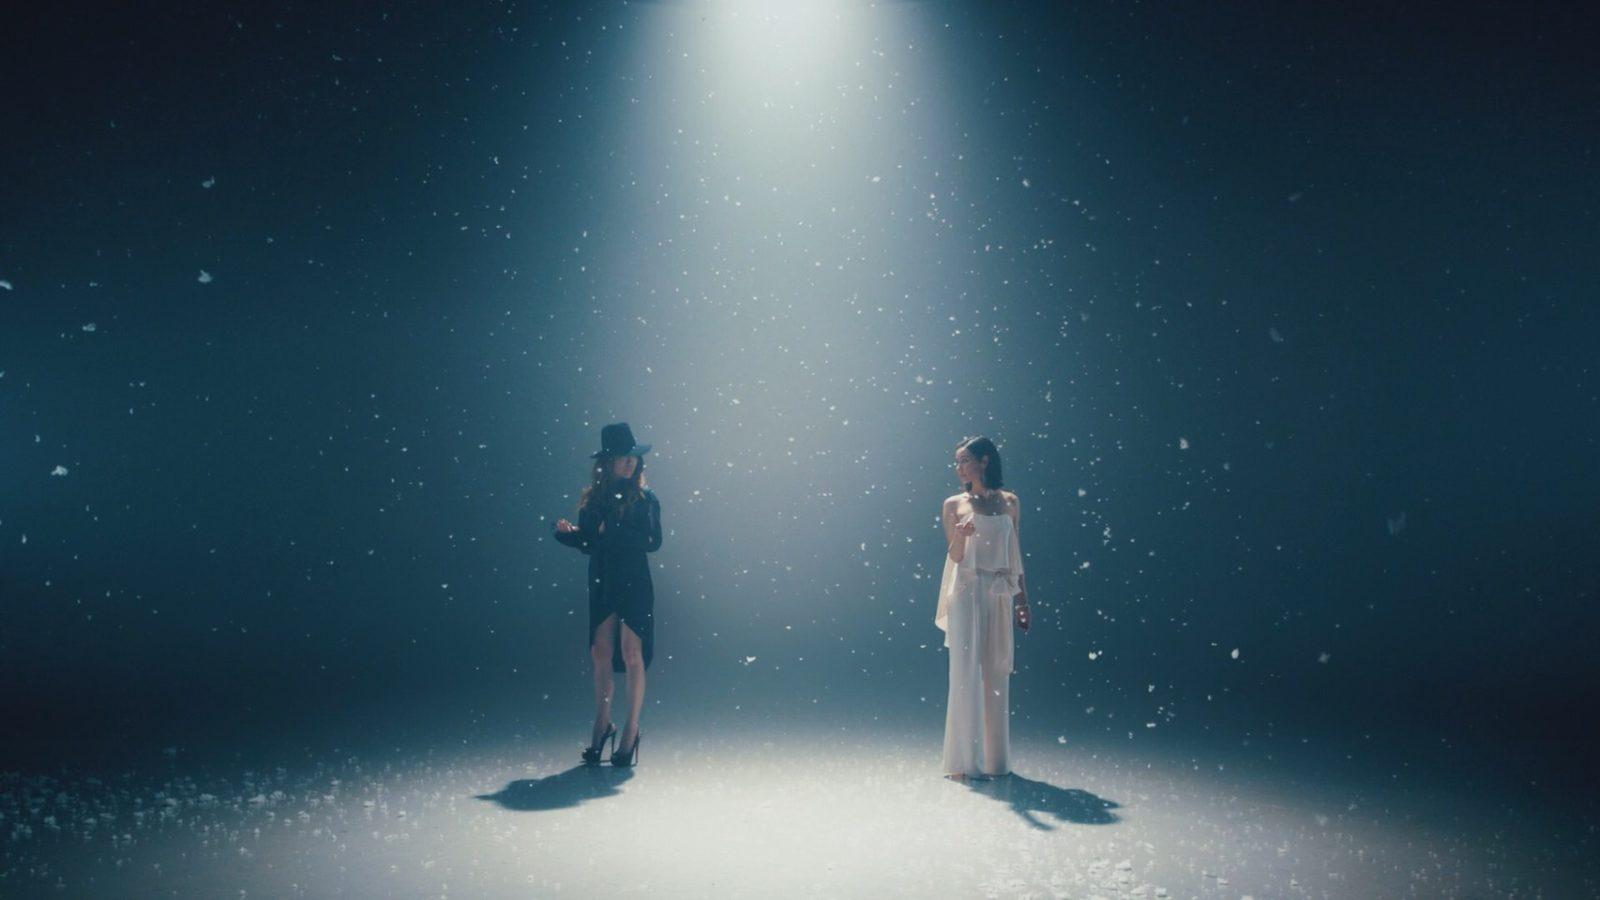 JUJU、New Album「I」より、平井堅書き下ろし、吉田羊とのデュエットで話題の新曲MVが本日公開サムネイル画像